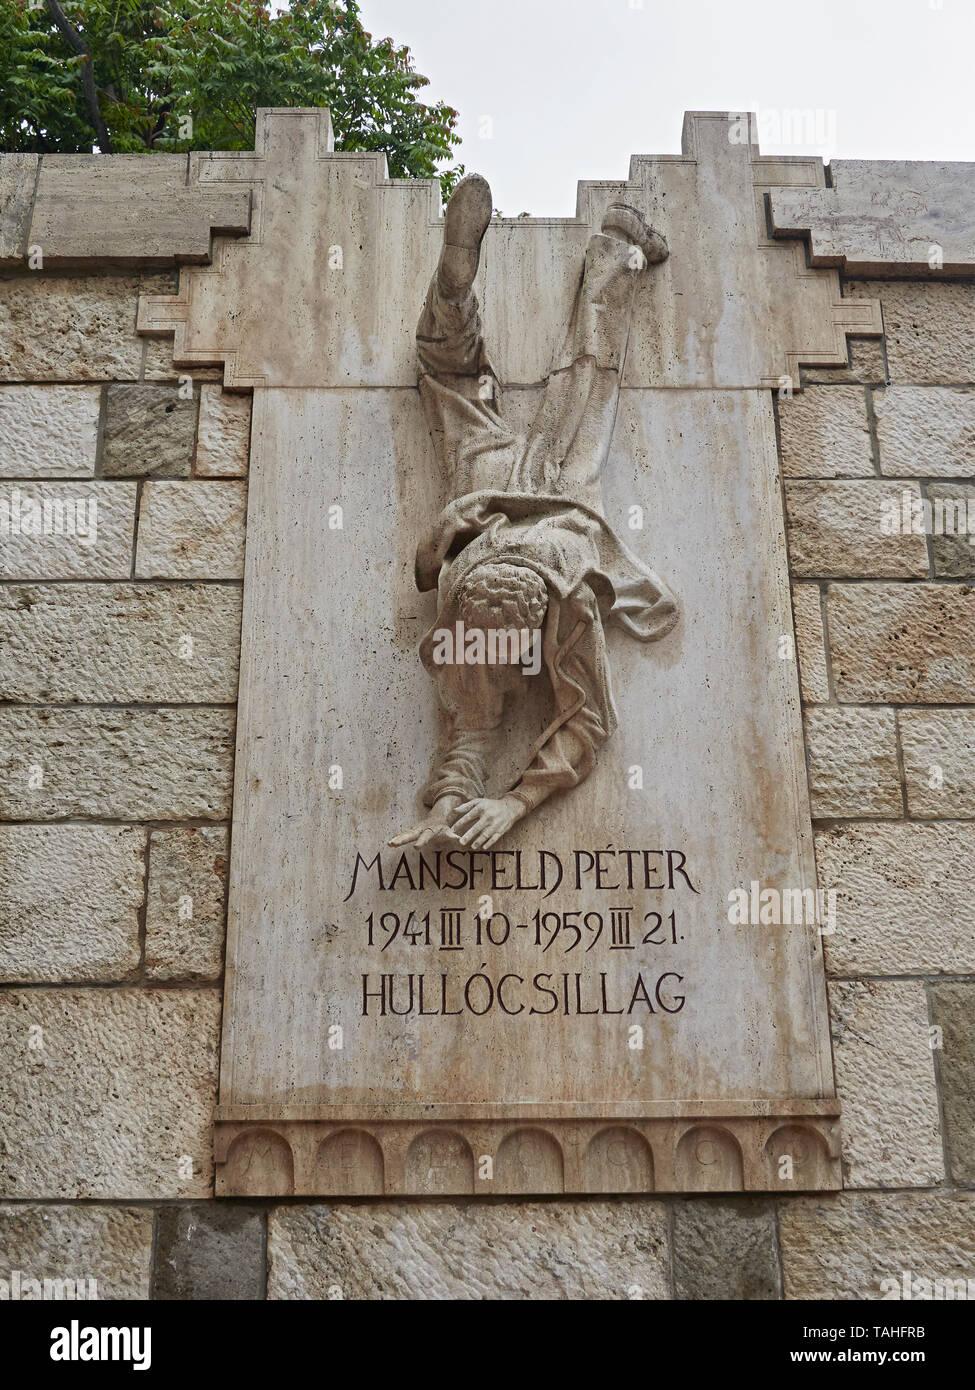 Peter Mansfeld Monument situated in Szabó Ilonka Utca under the Fisherman's Bastion Budapest Hungary Stock Photo